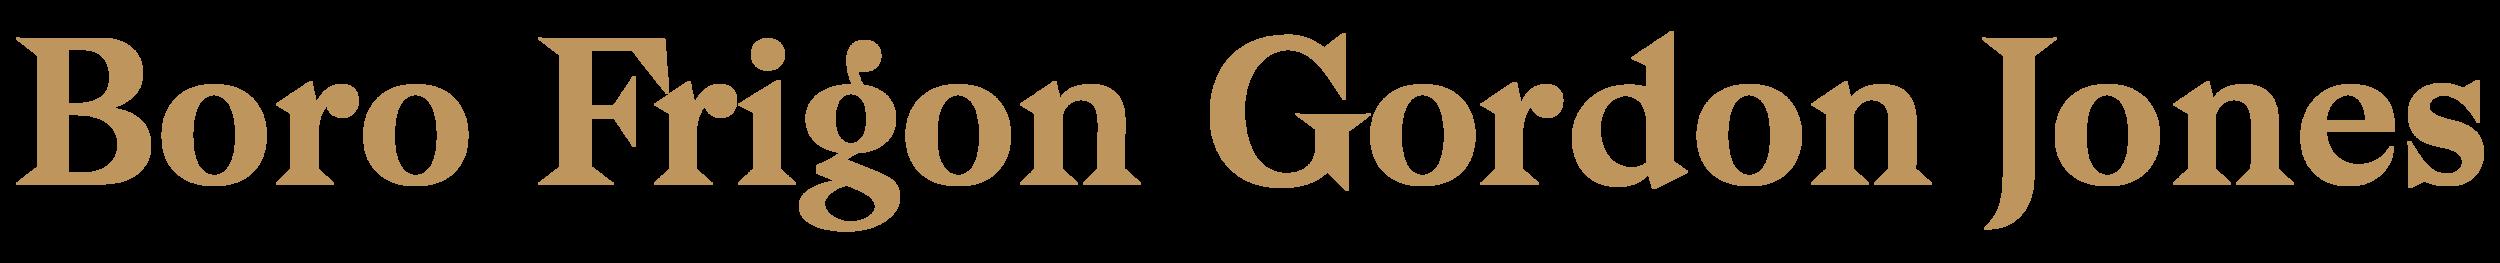 BFGJ_Final Logo-Name-02.png